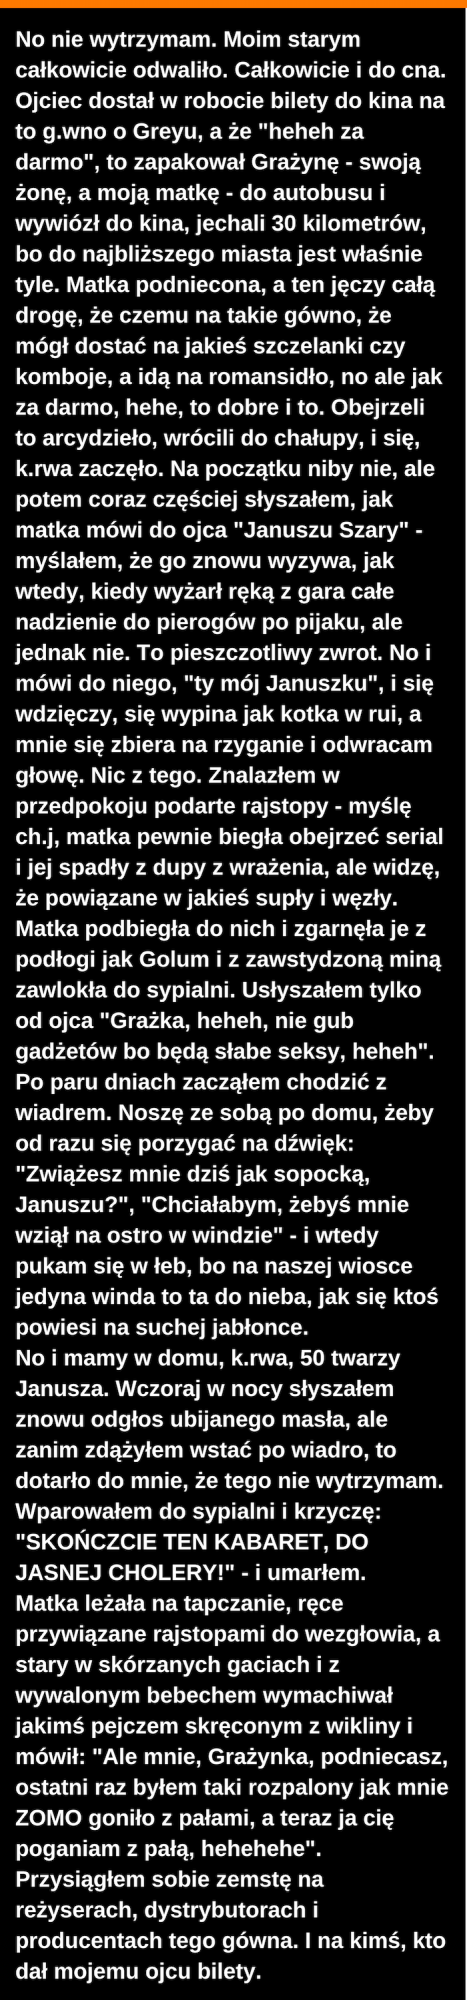 50 twarzy Janusza :D